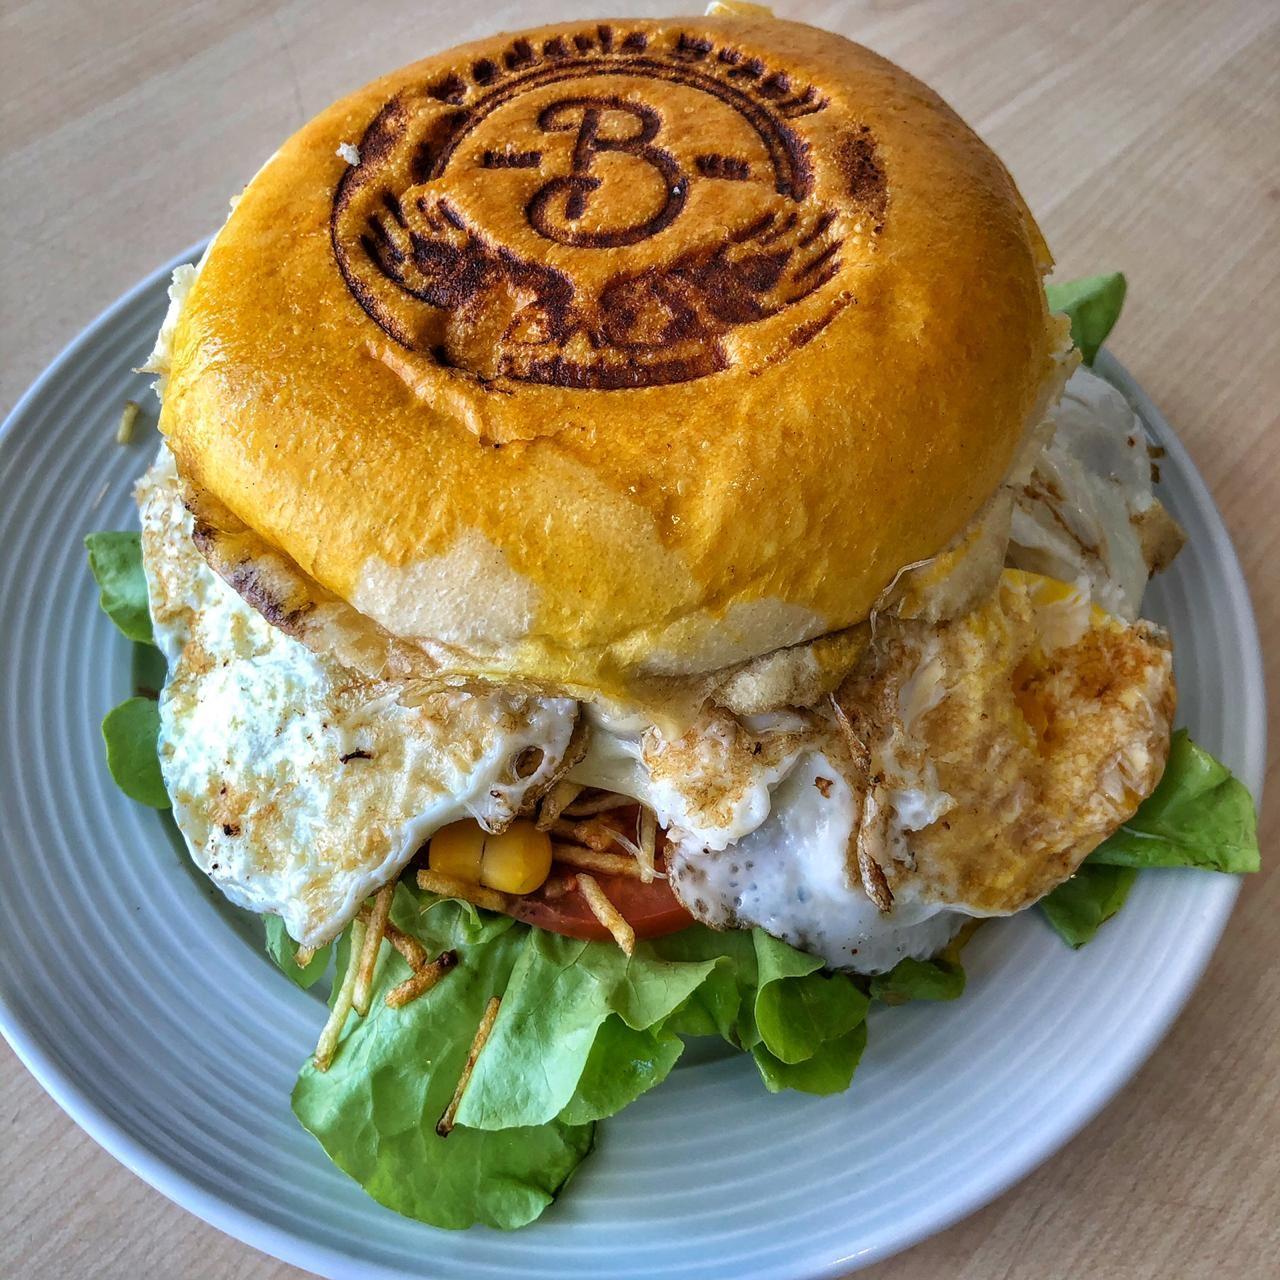 hamburguer-padaria-brasil-taubate